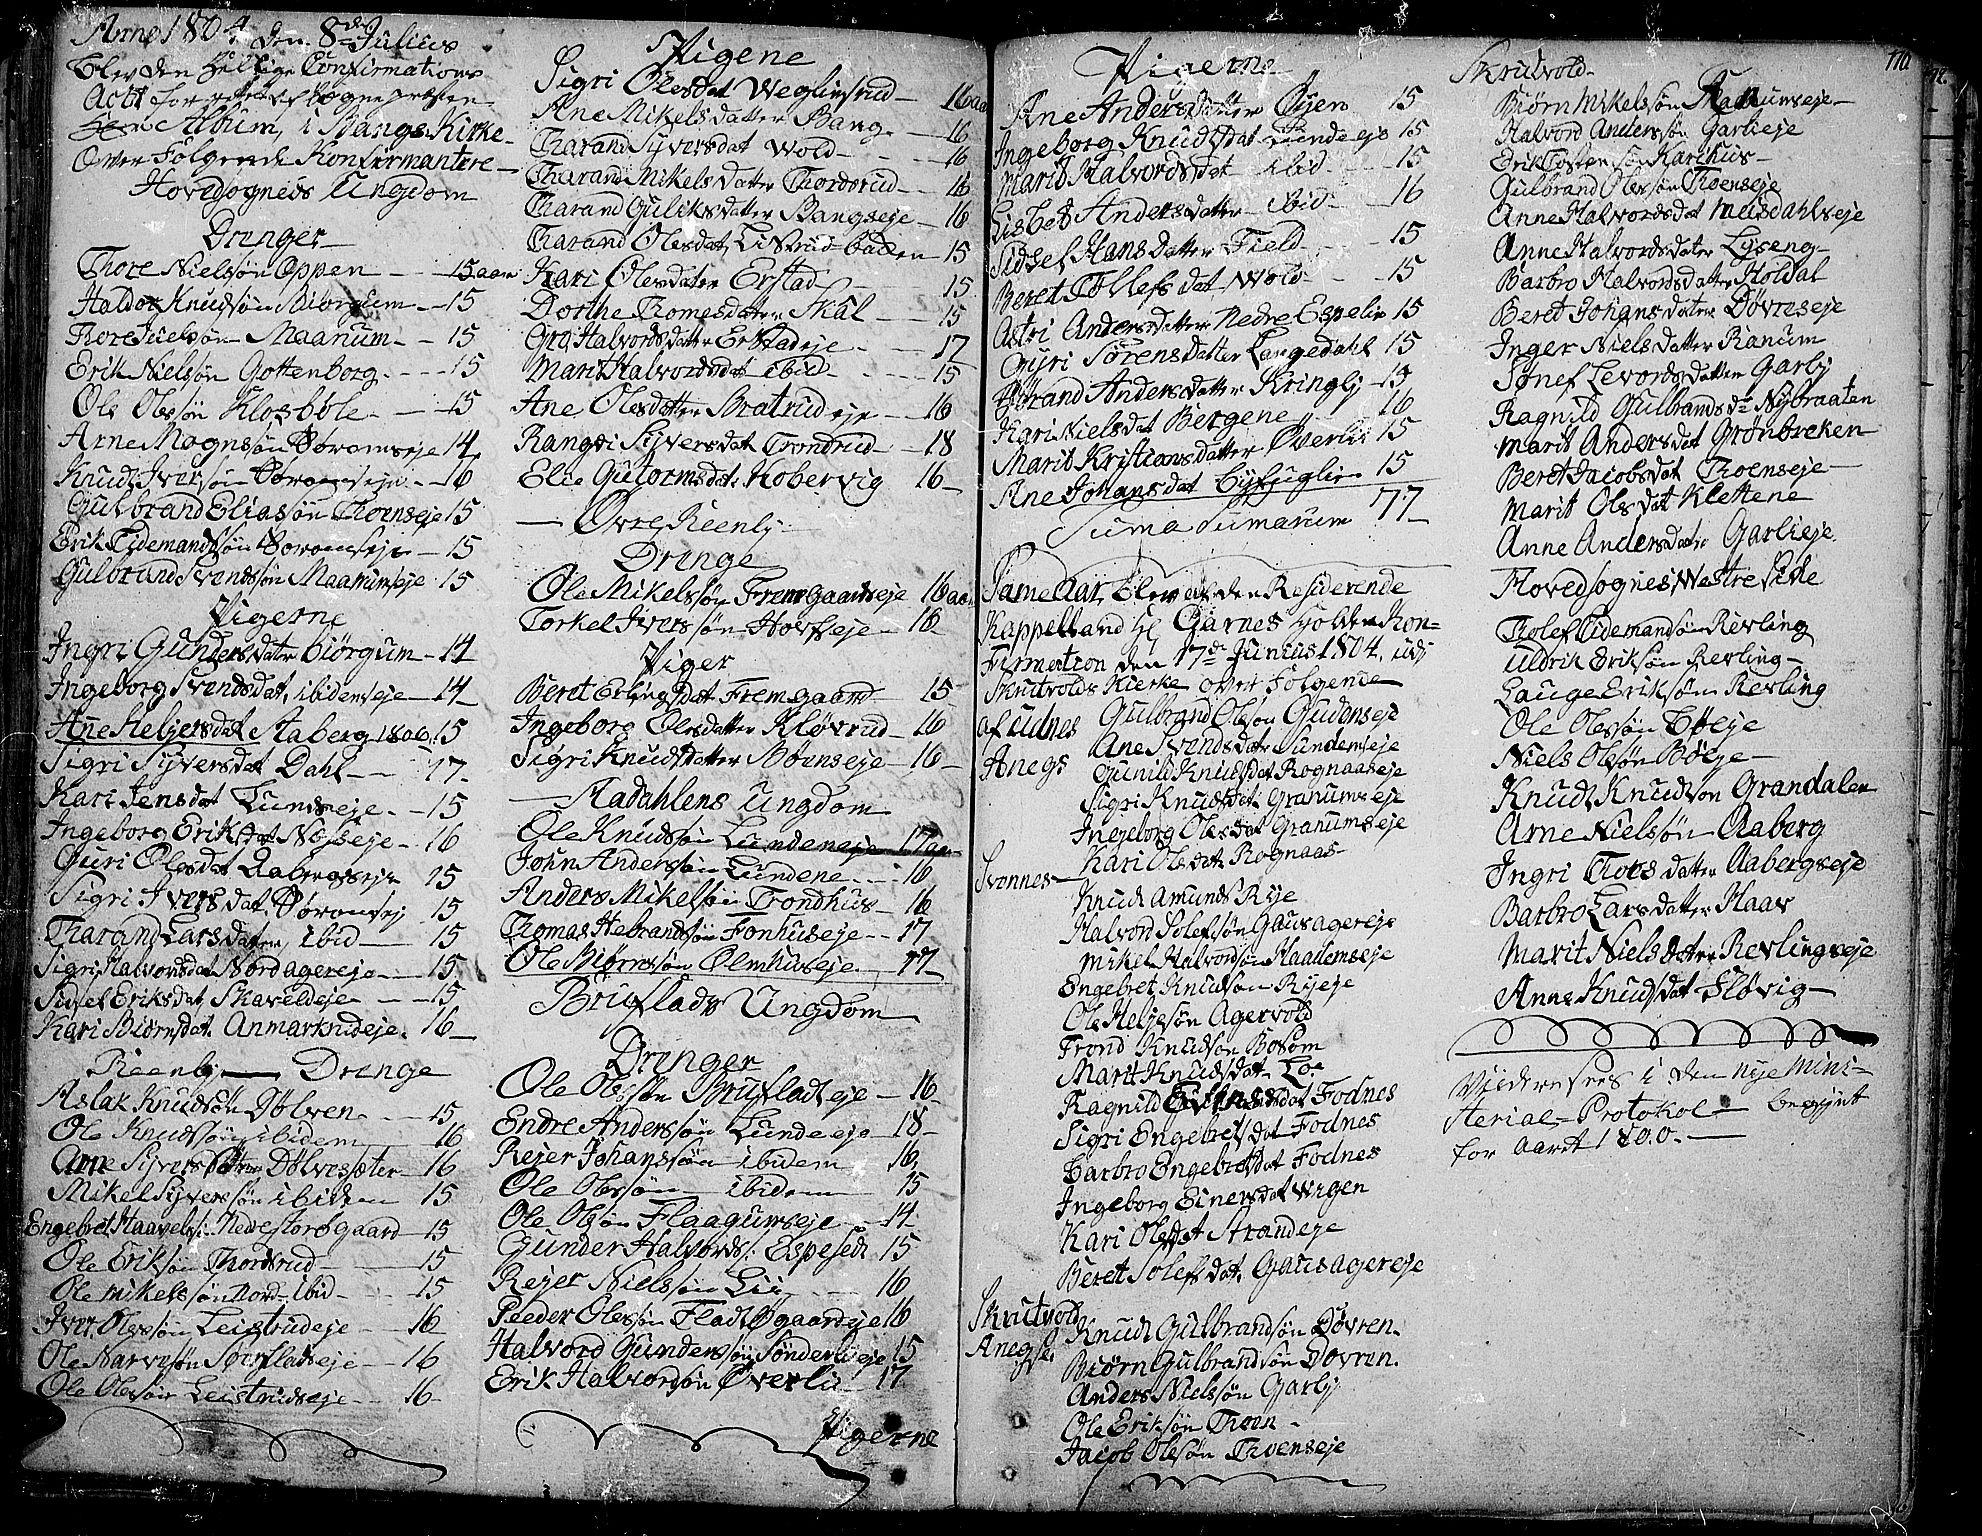 SAH, Aurdal prestekontor, Ministerialbok nr. 6, 1781-1804, s. 170